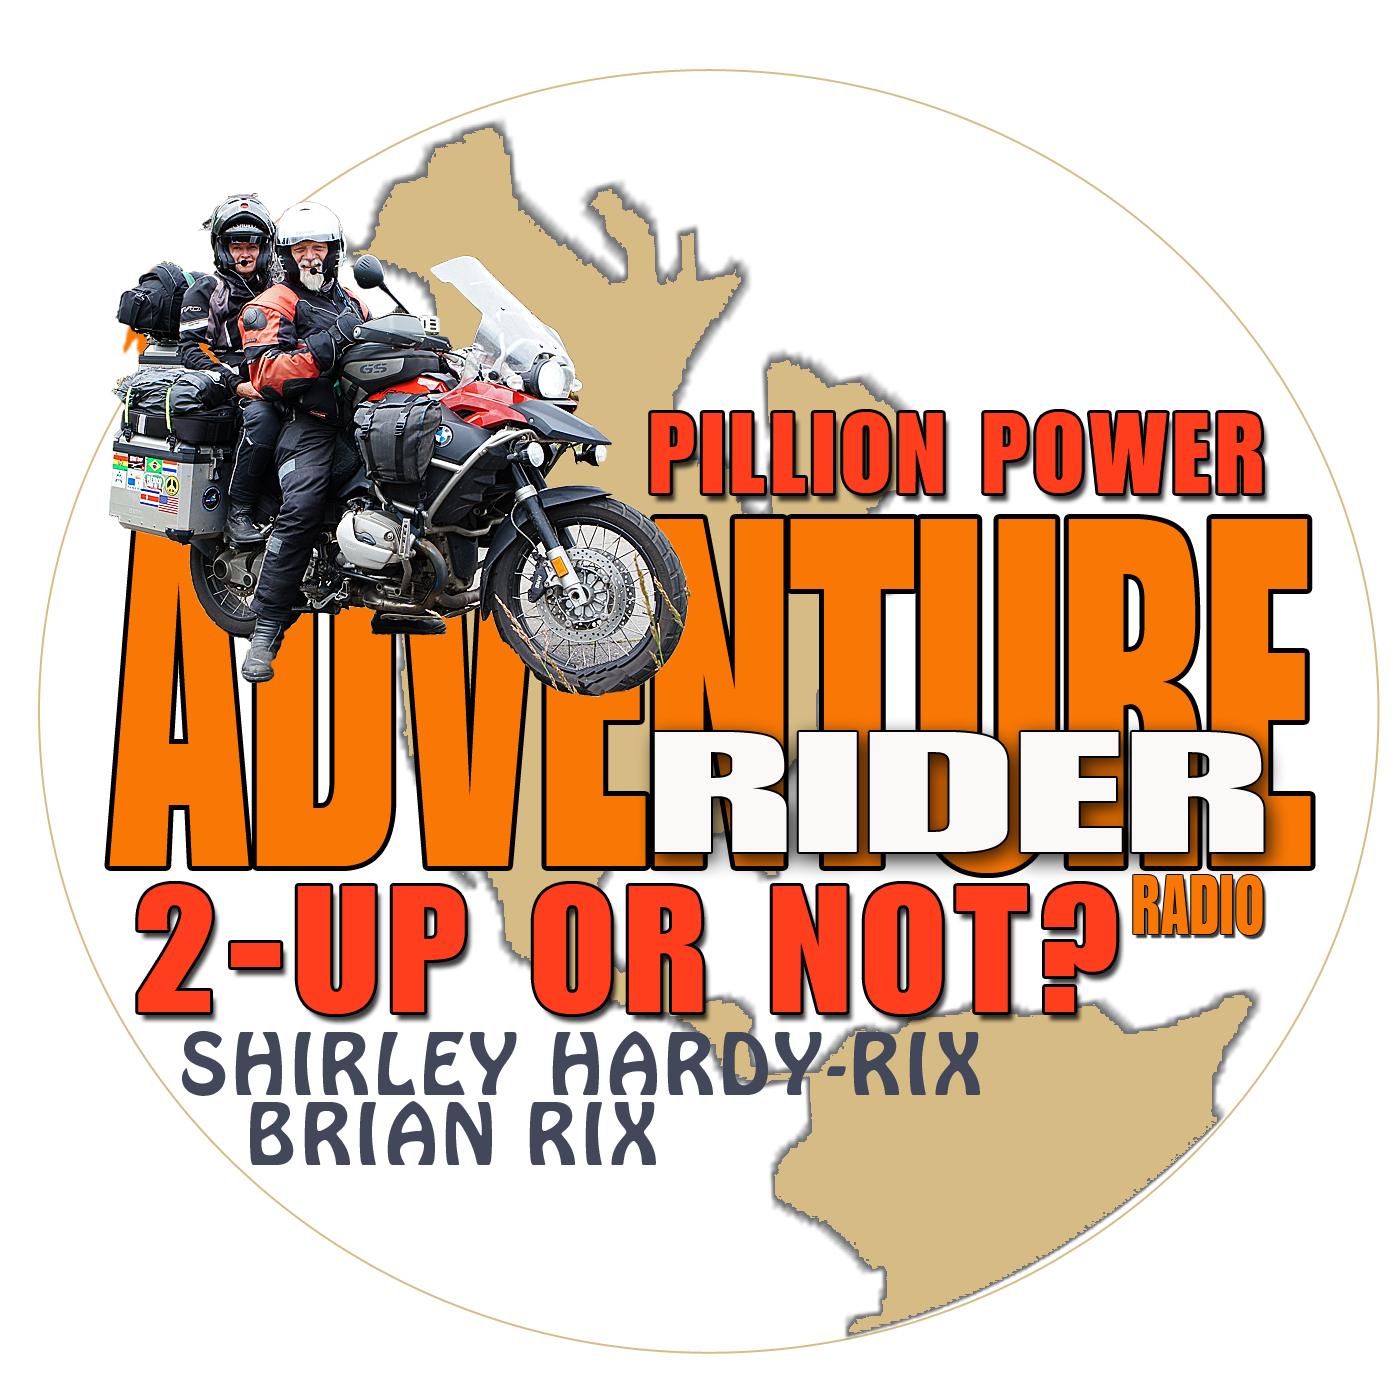 Shirley-Hardy-Rix-Brian-Rix-Pillion-Power-1400px.png